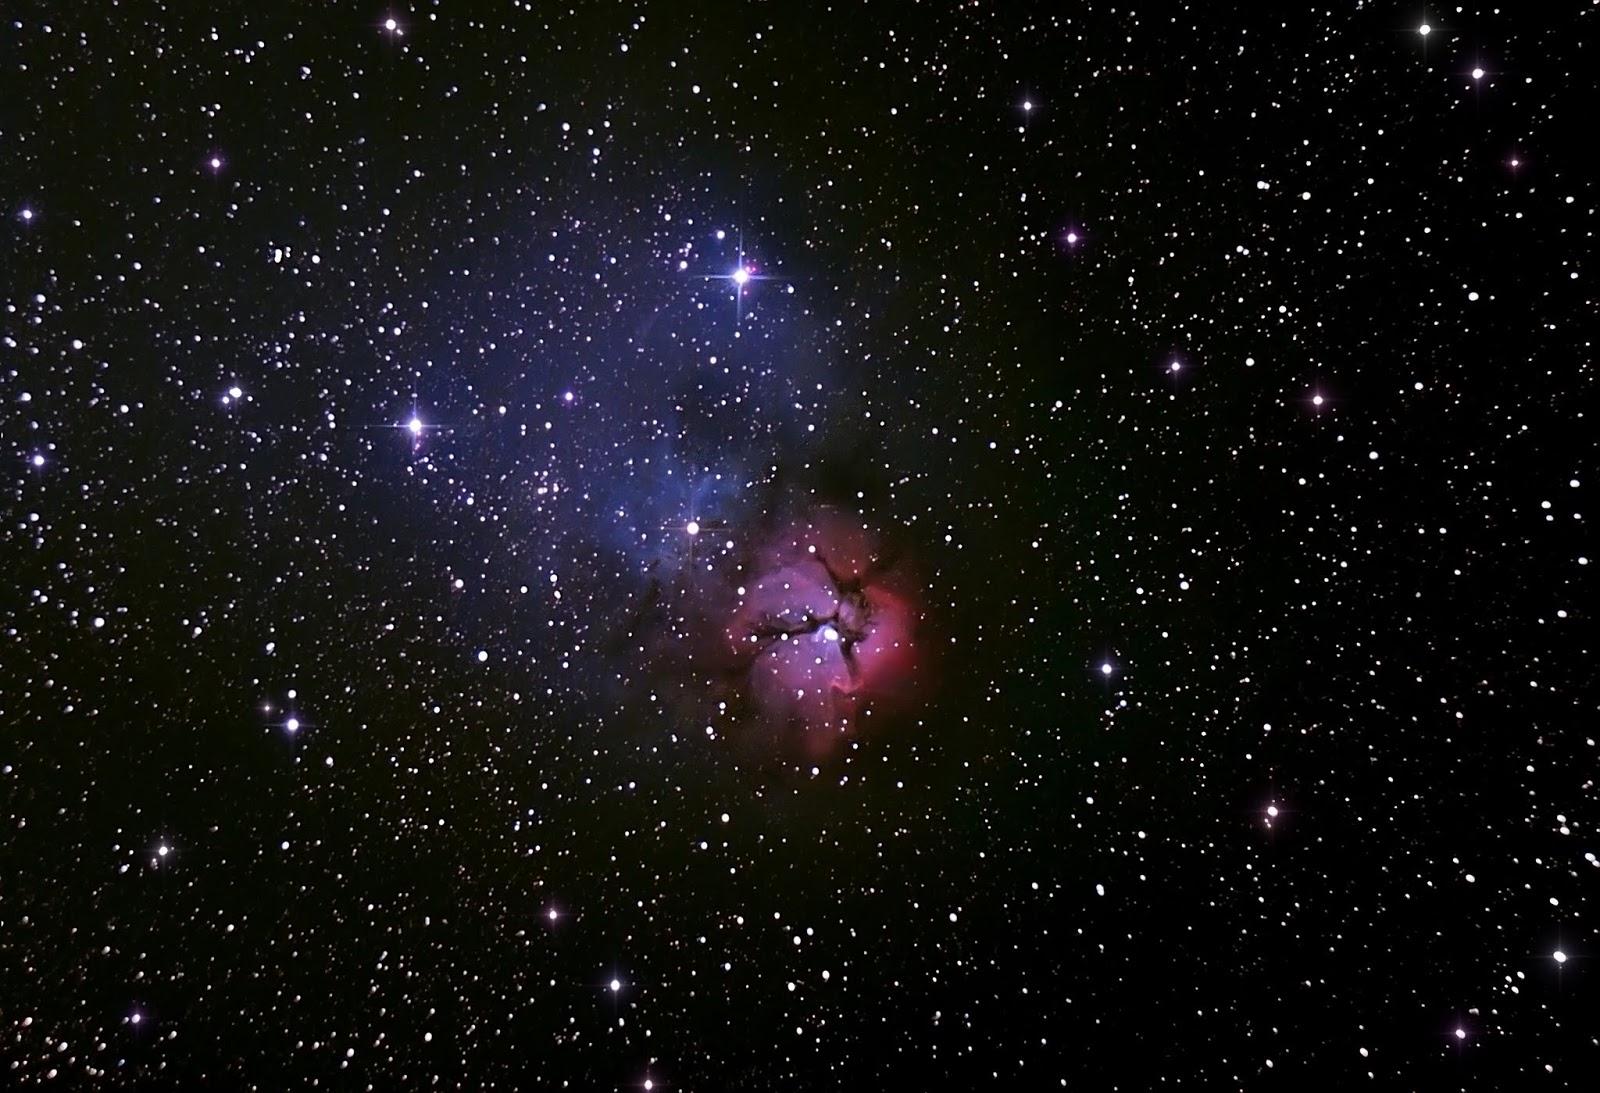 Trifid+Nebula3+master+image+copy_filtere